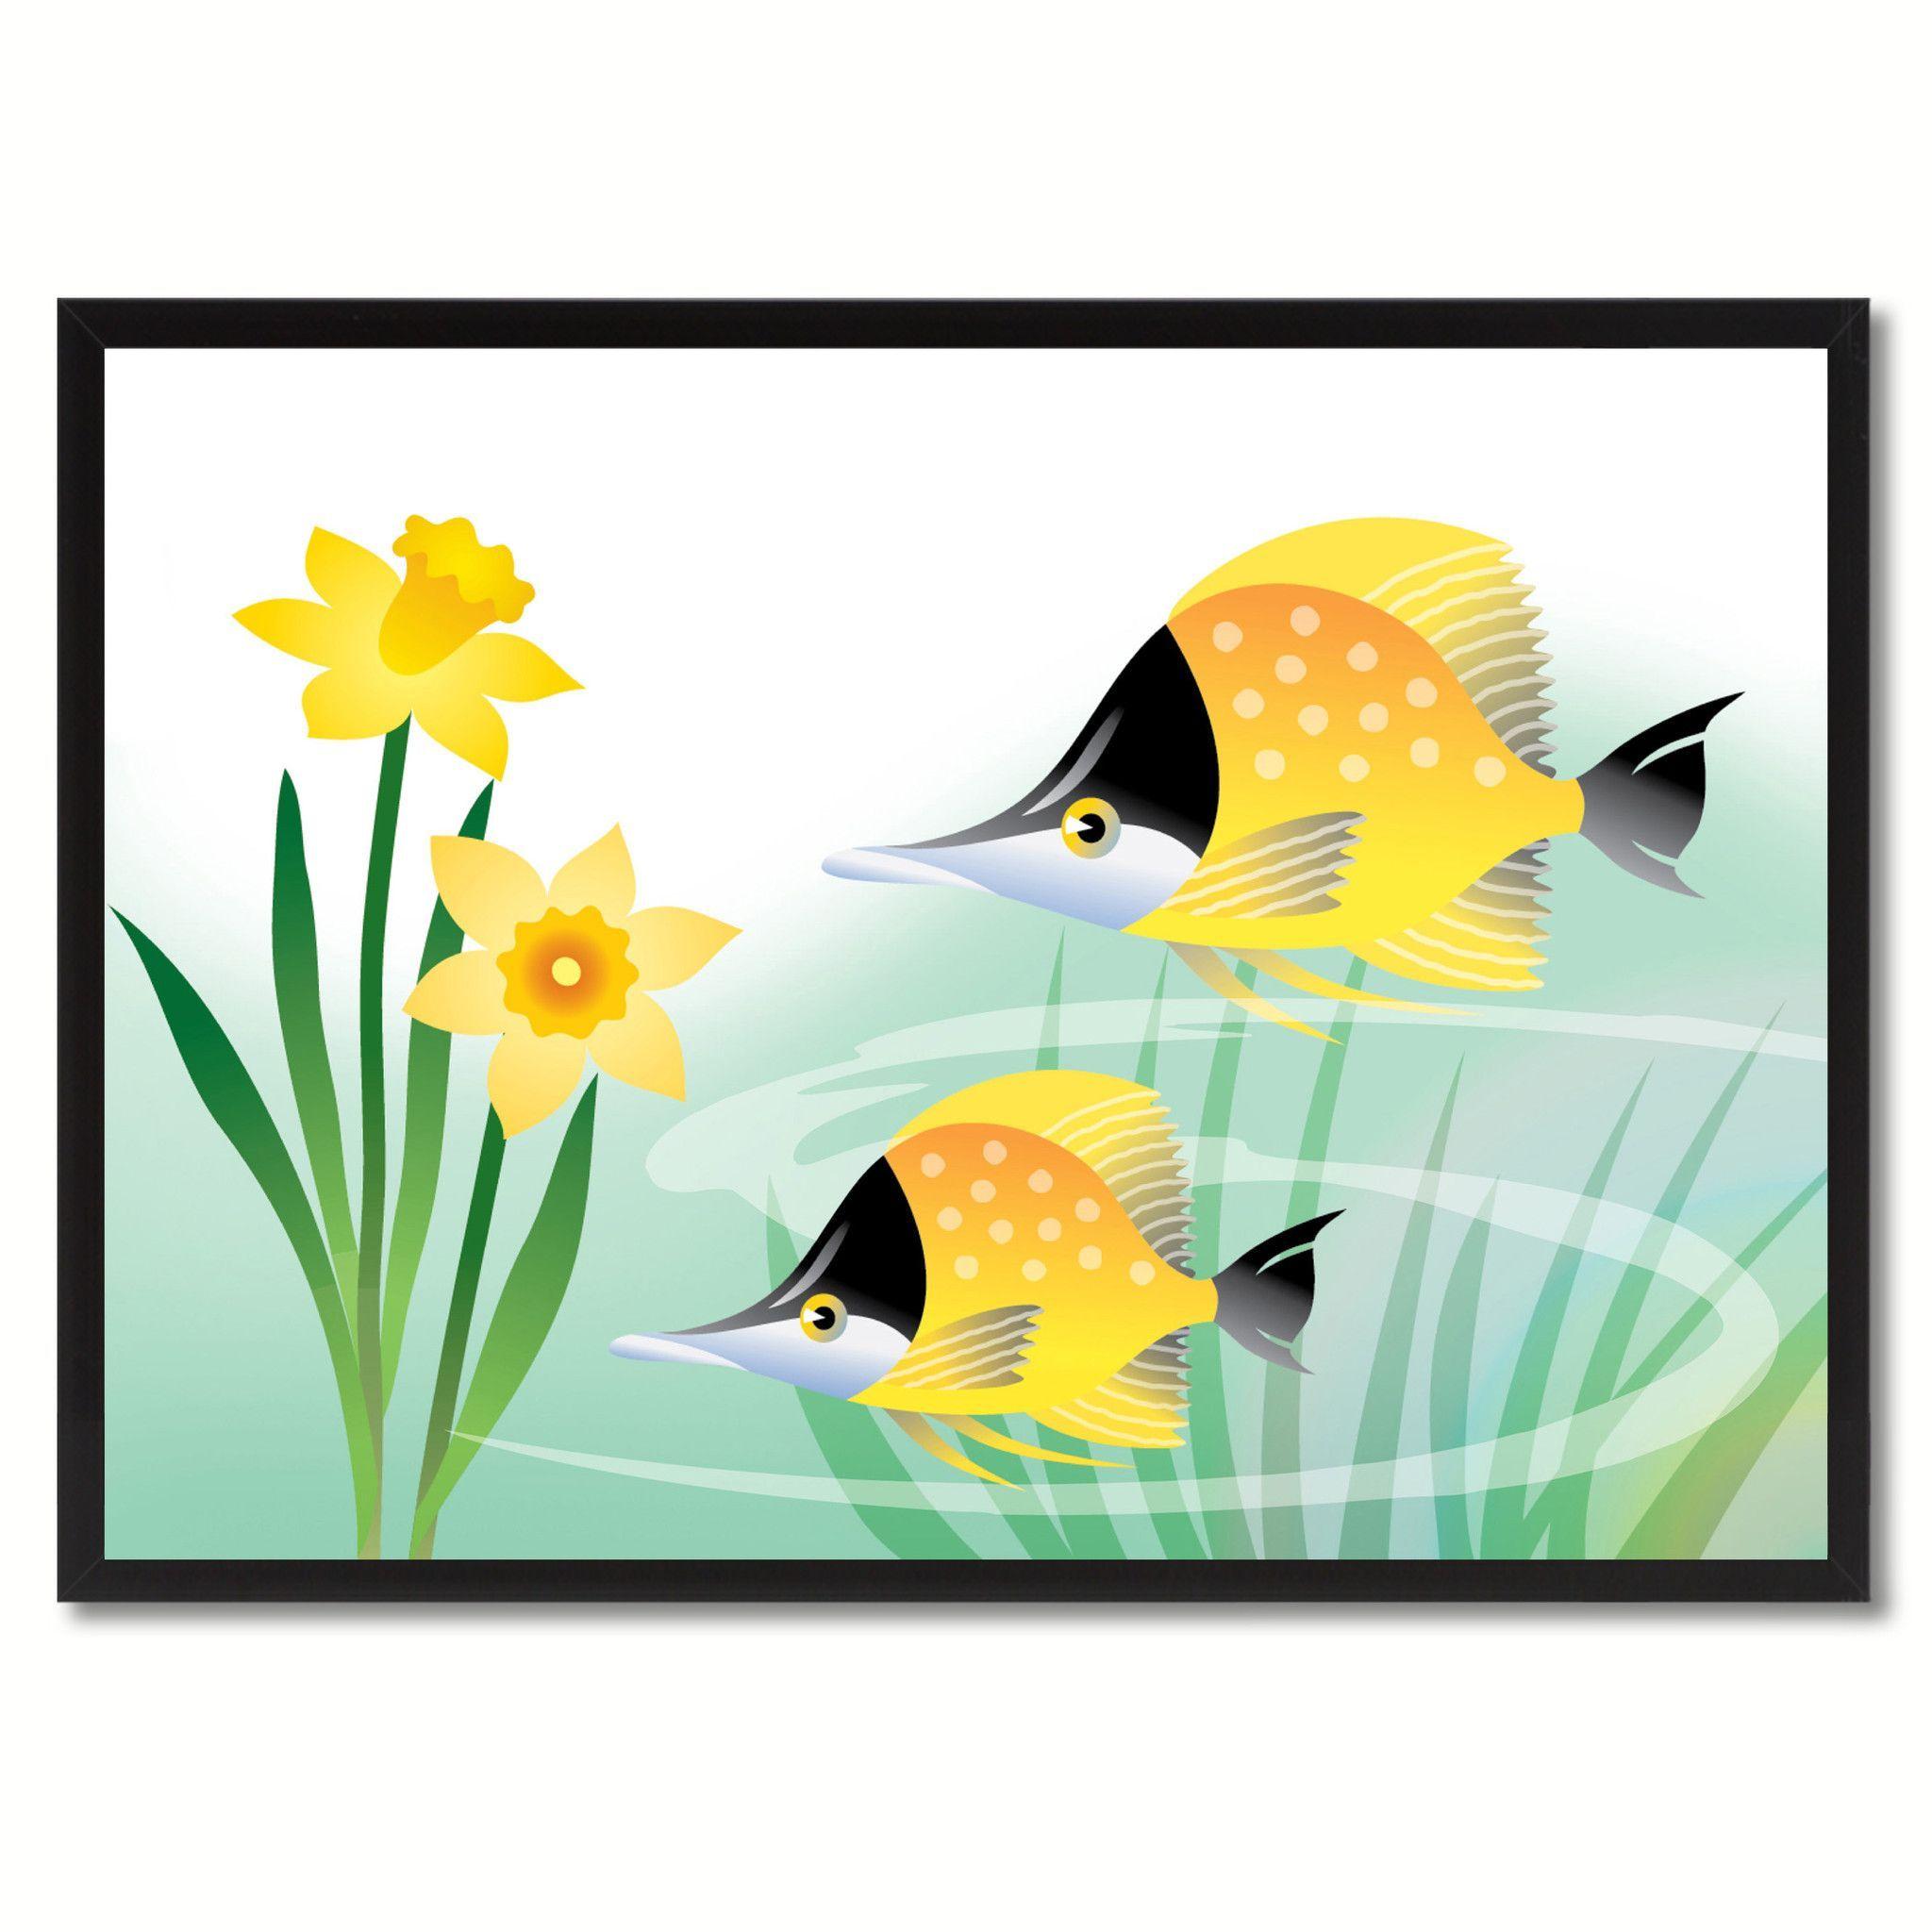 Fish & Flower Illustration Canvas Prints Frames Kids Room Décor Wall ...